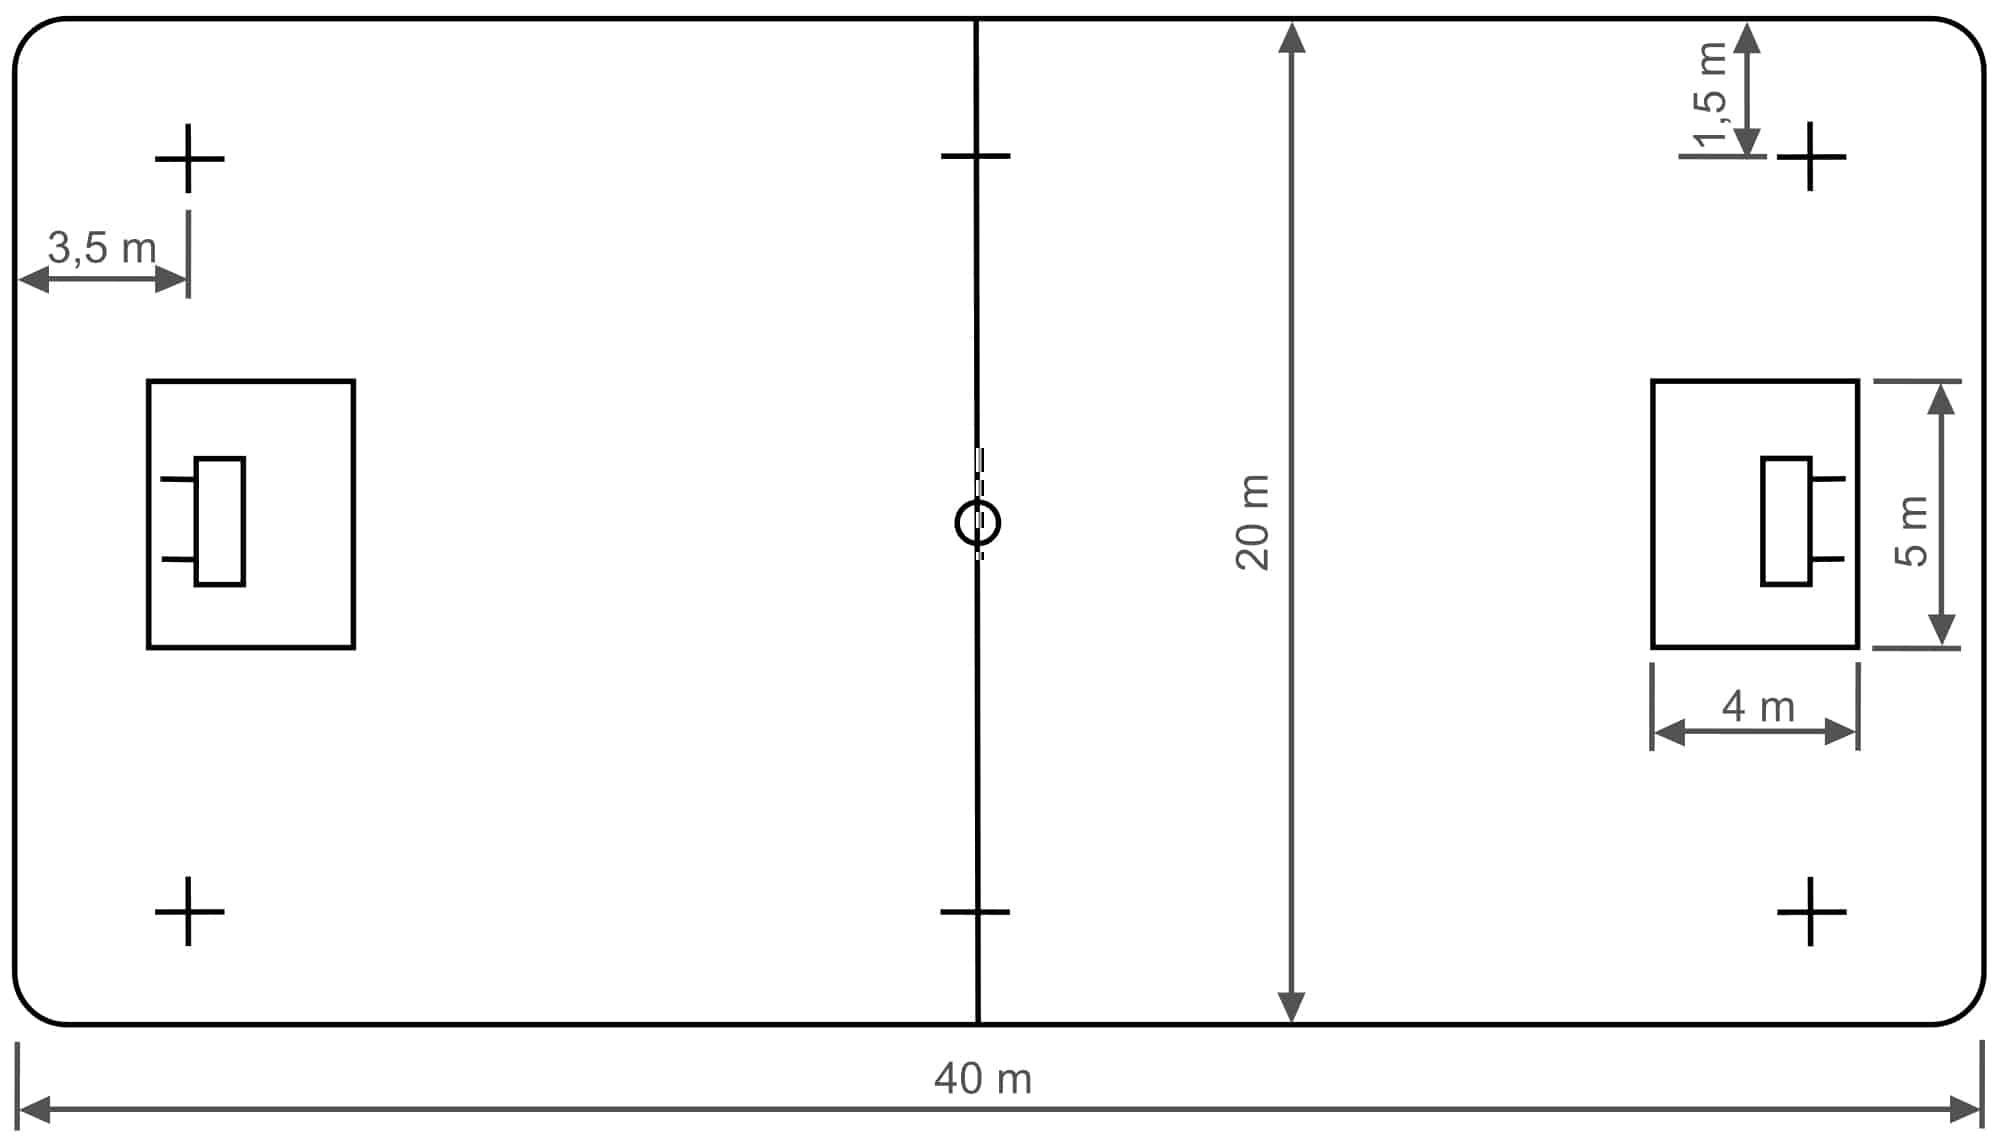 handball court diagram winnebago wiring floorball un sport de passion planetloisirs